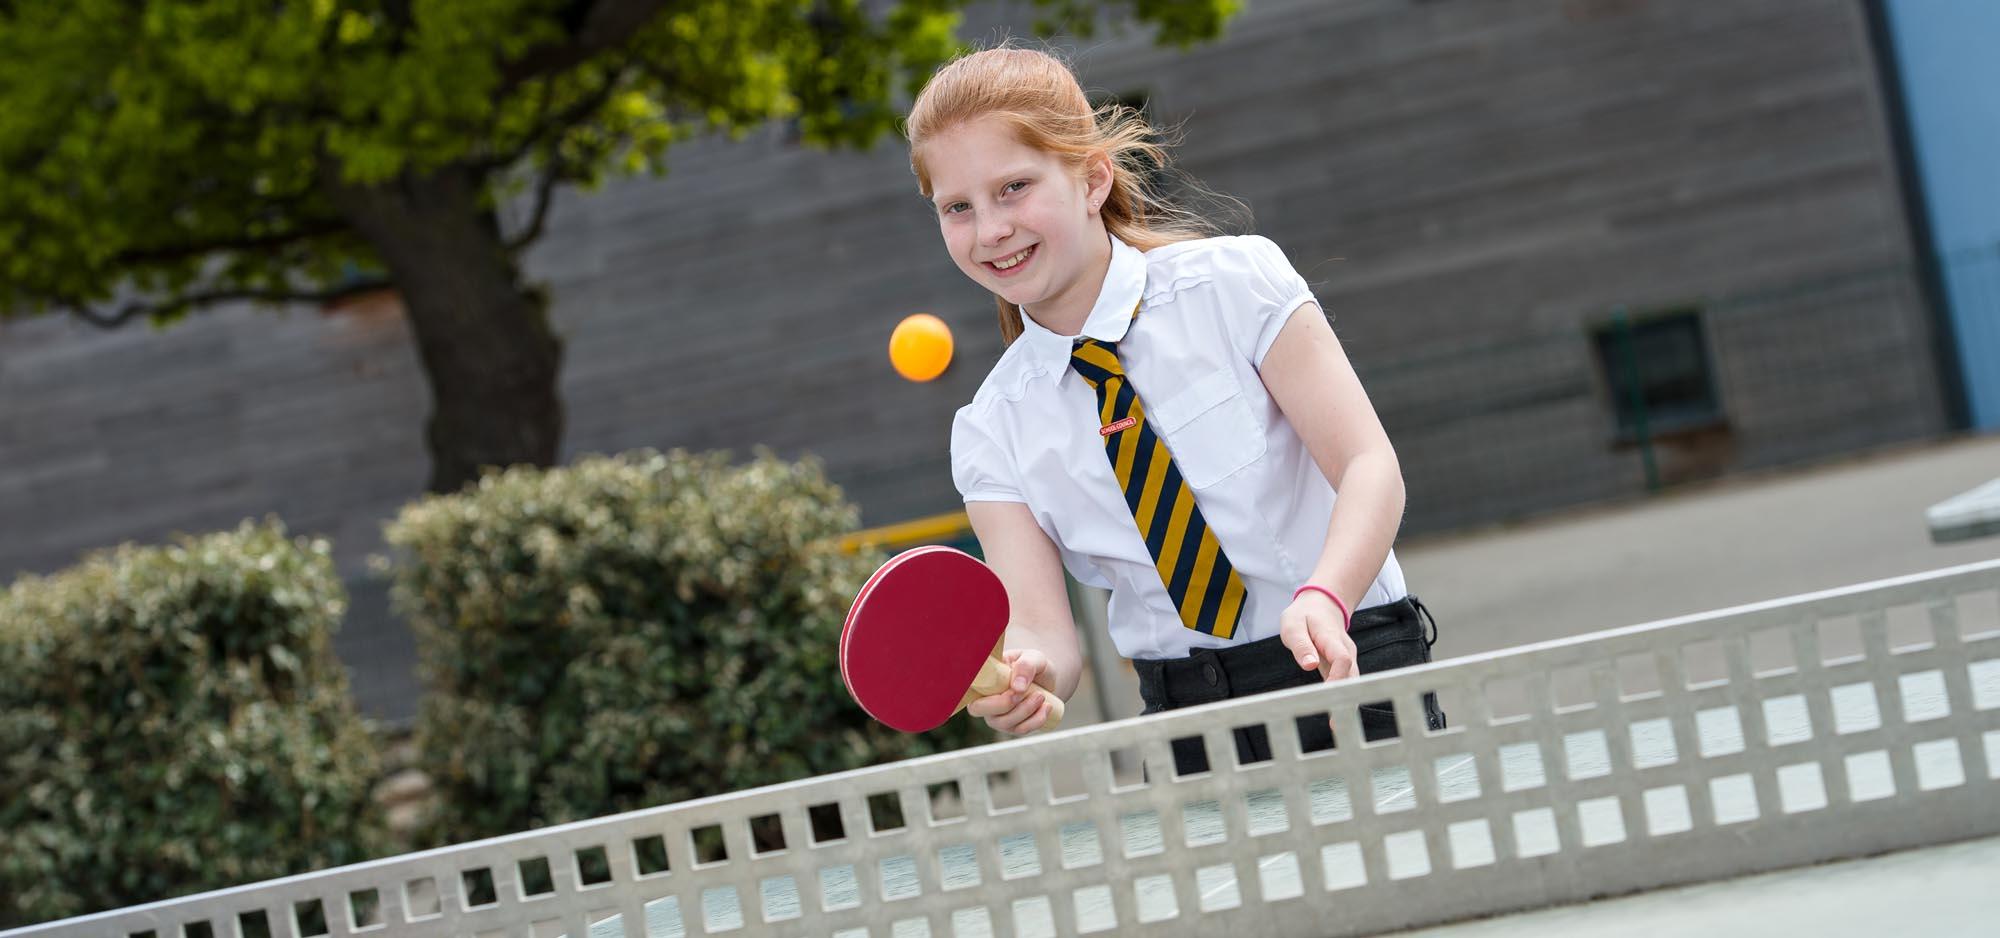 girl-playing-table-tennis